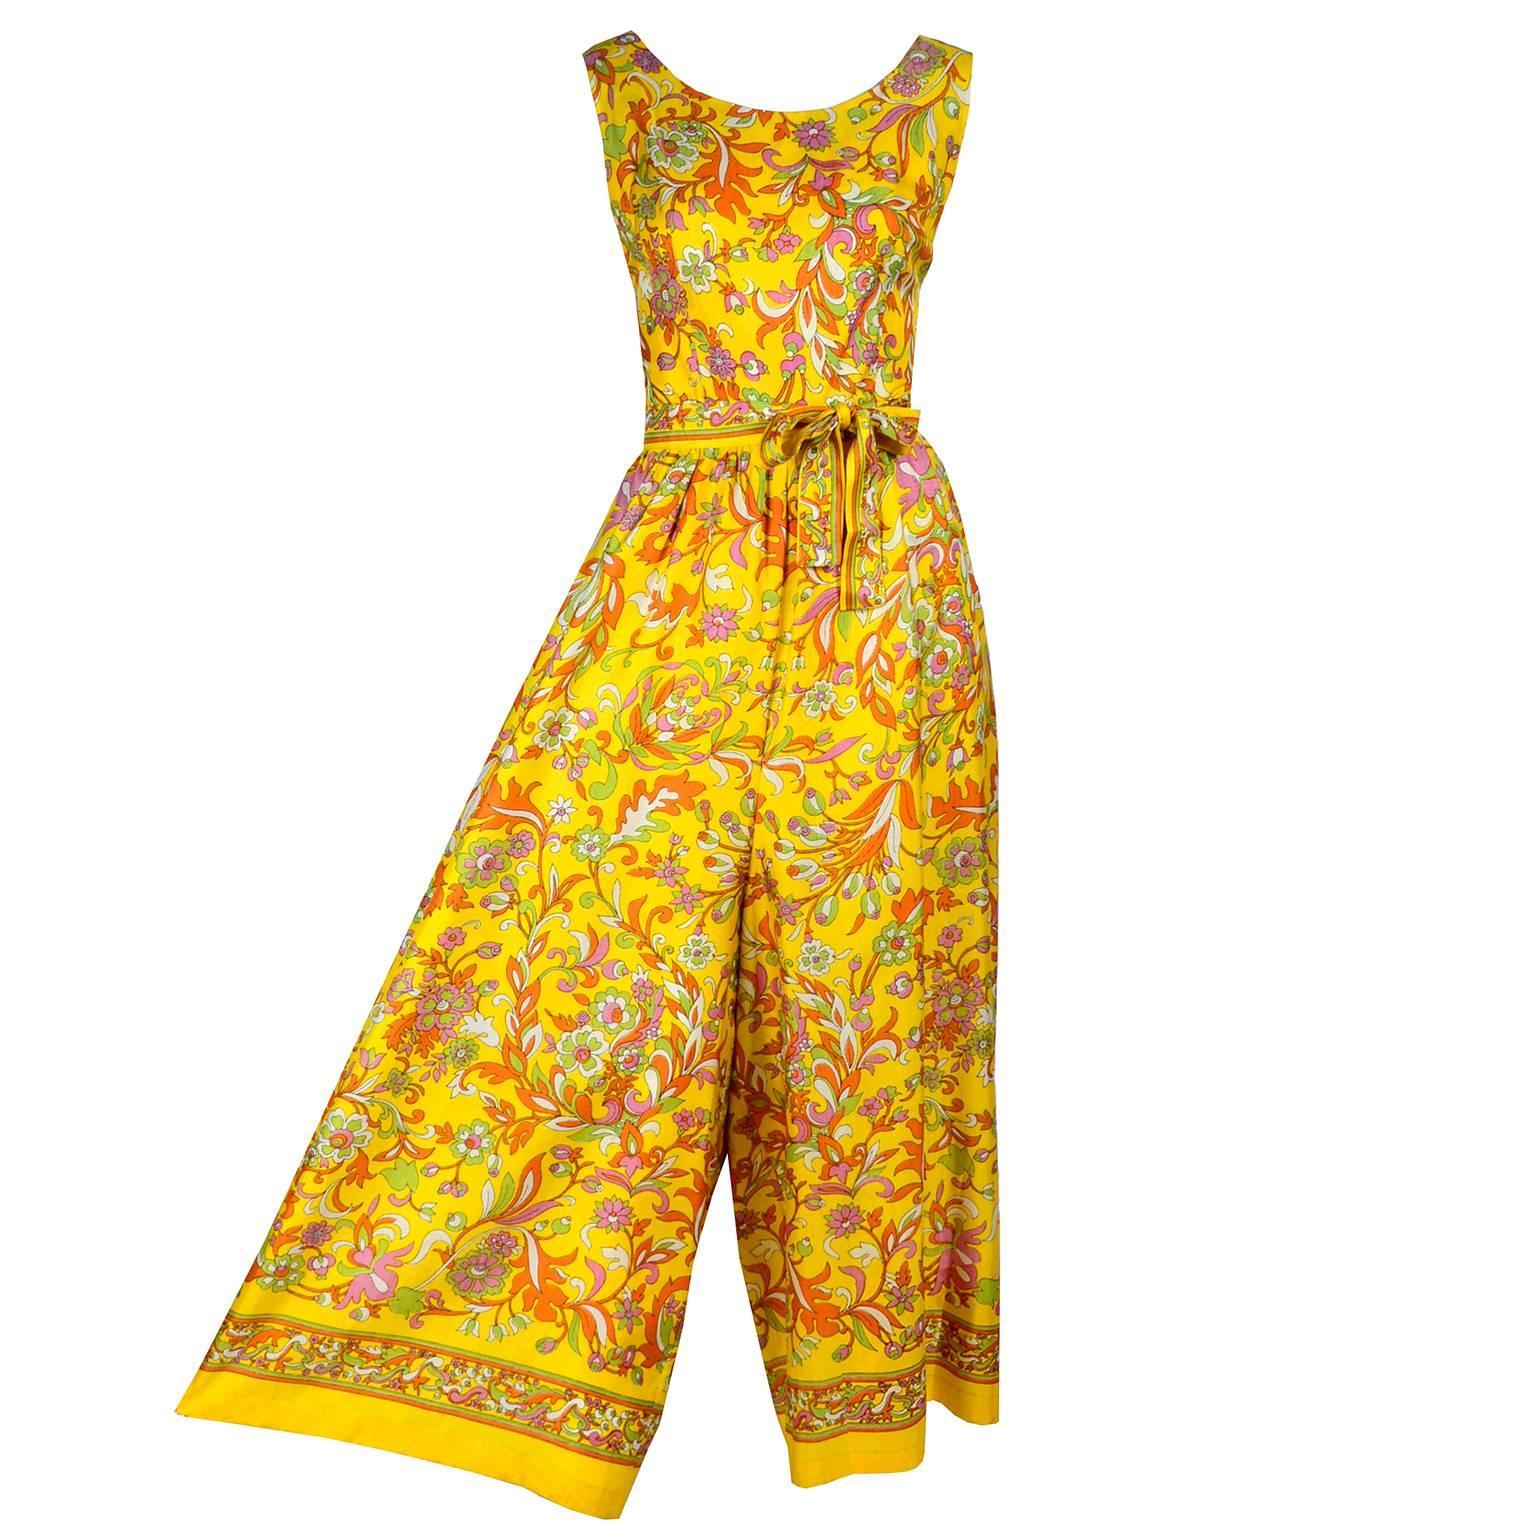 1970s Sea Isle Fashions Vintage Orange Pink & Yellow Palazzo Pant Jumpsuit